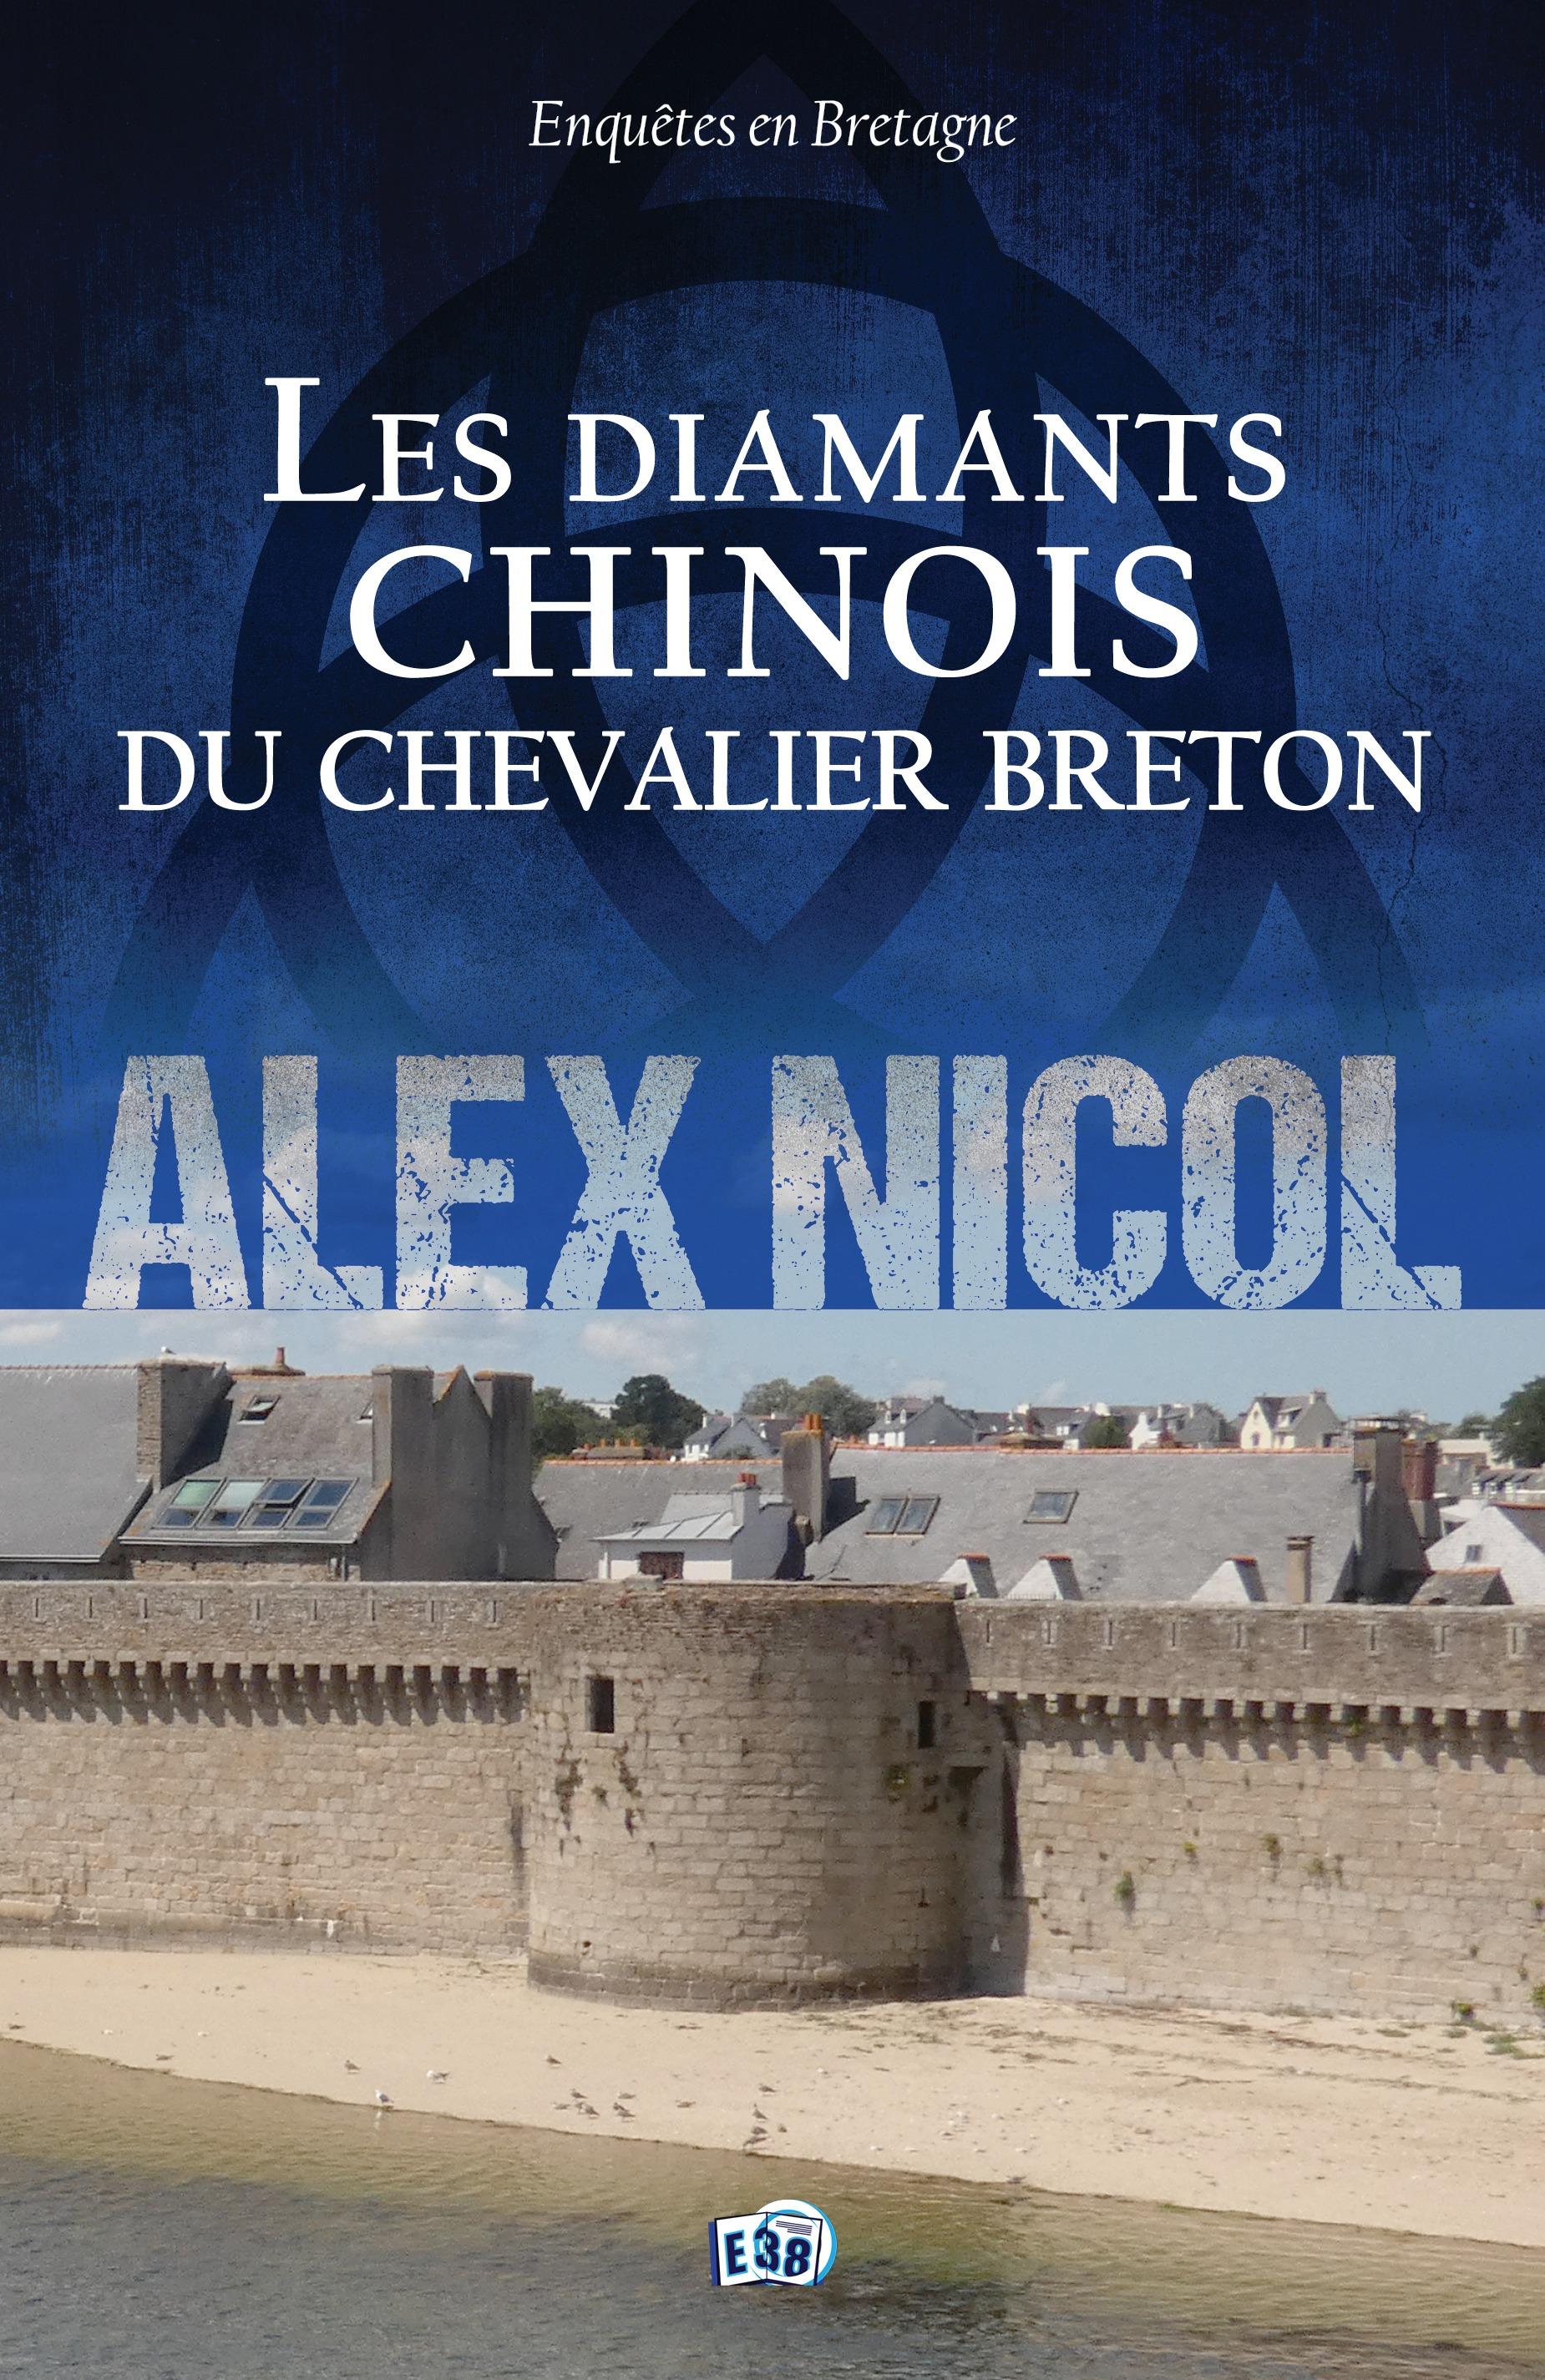 Les diamants chinois du chevalier breton